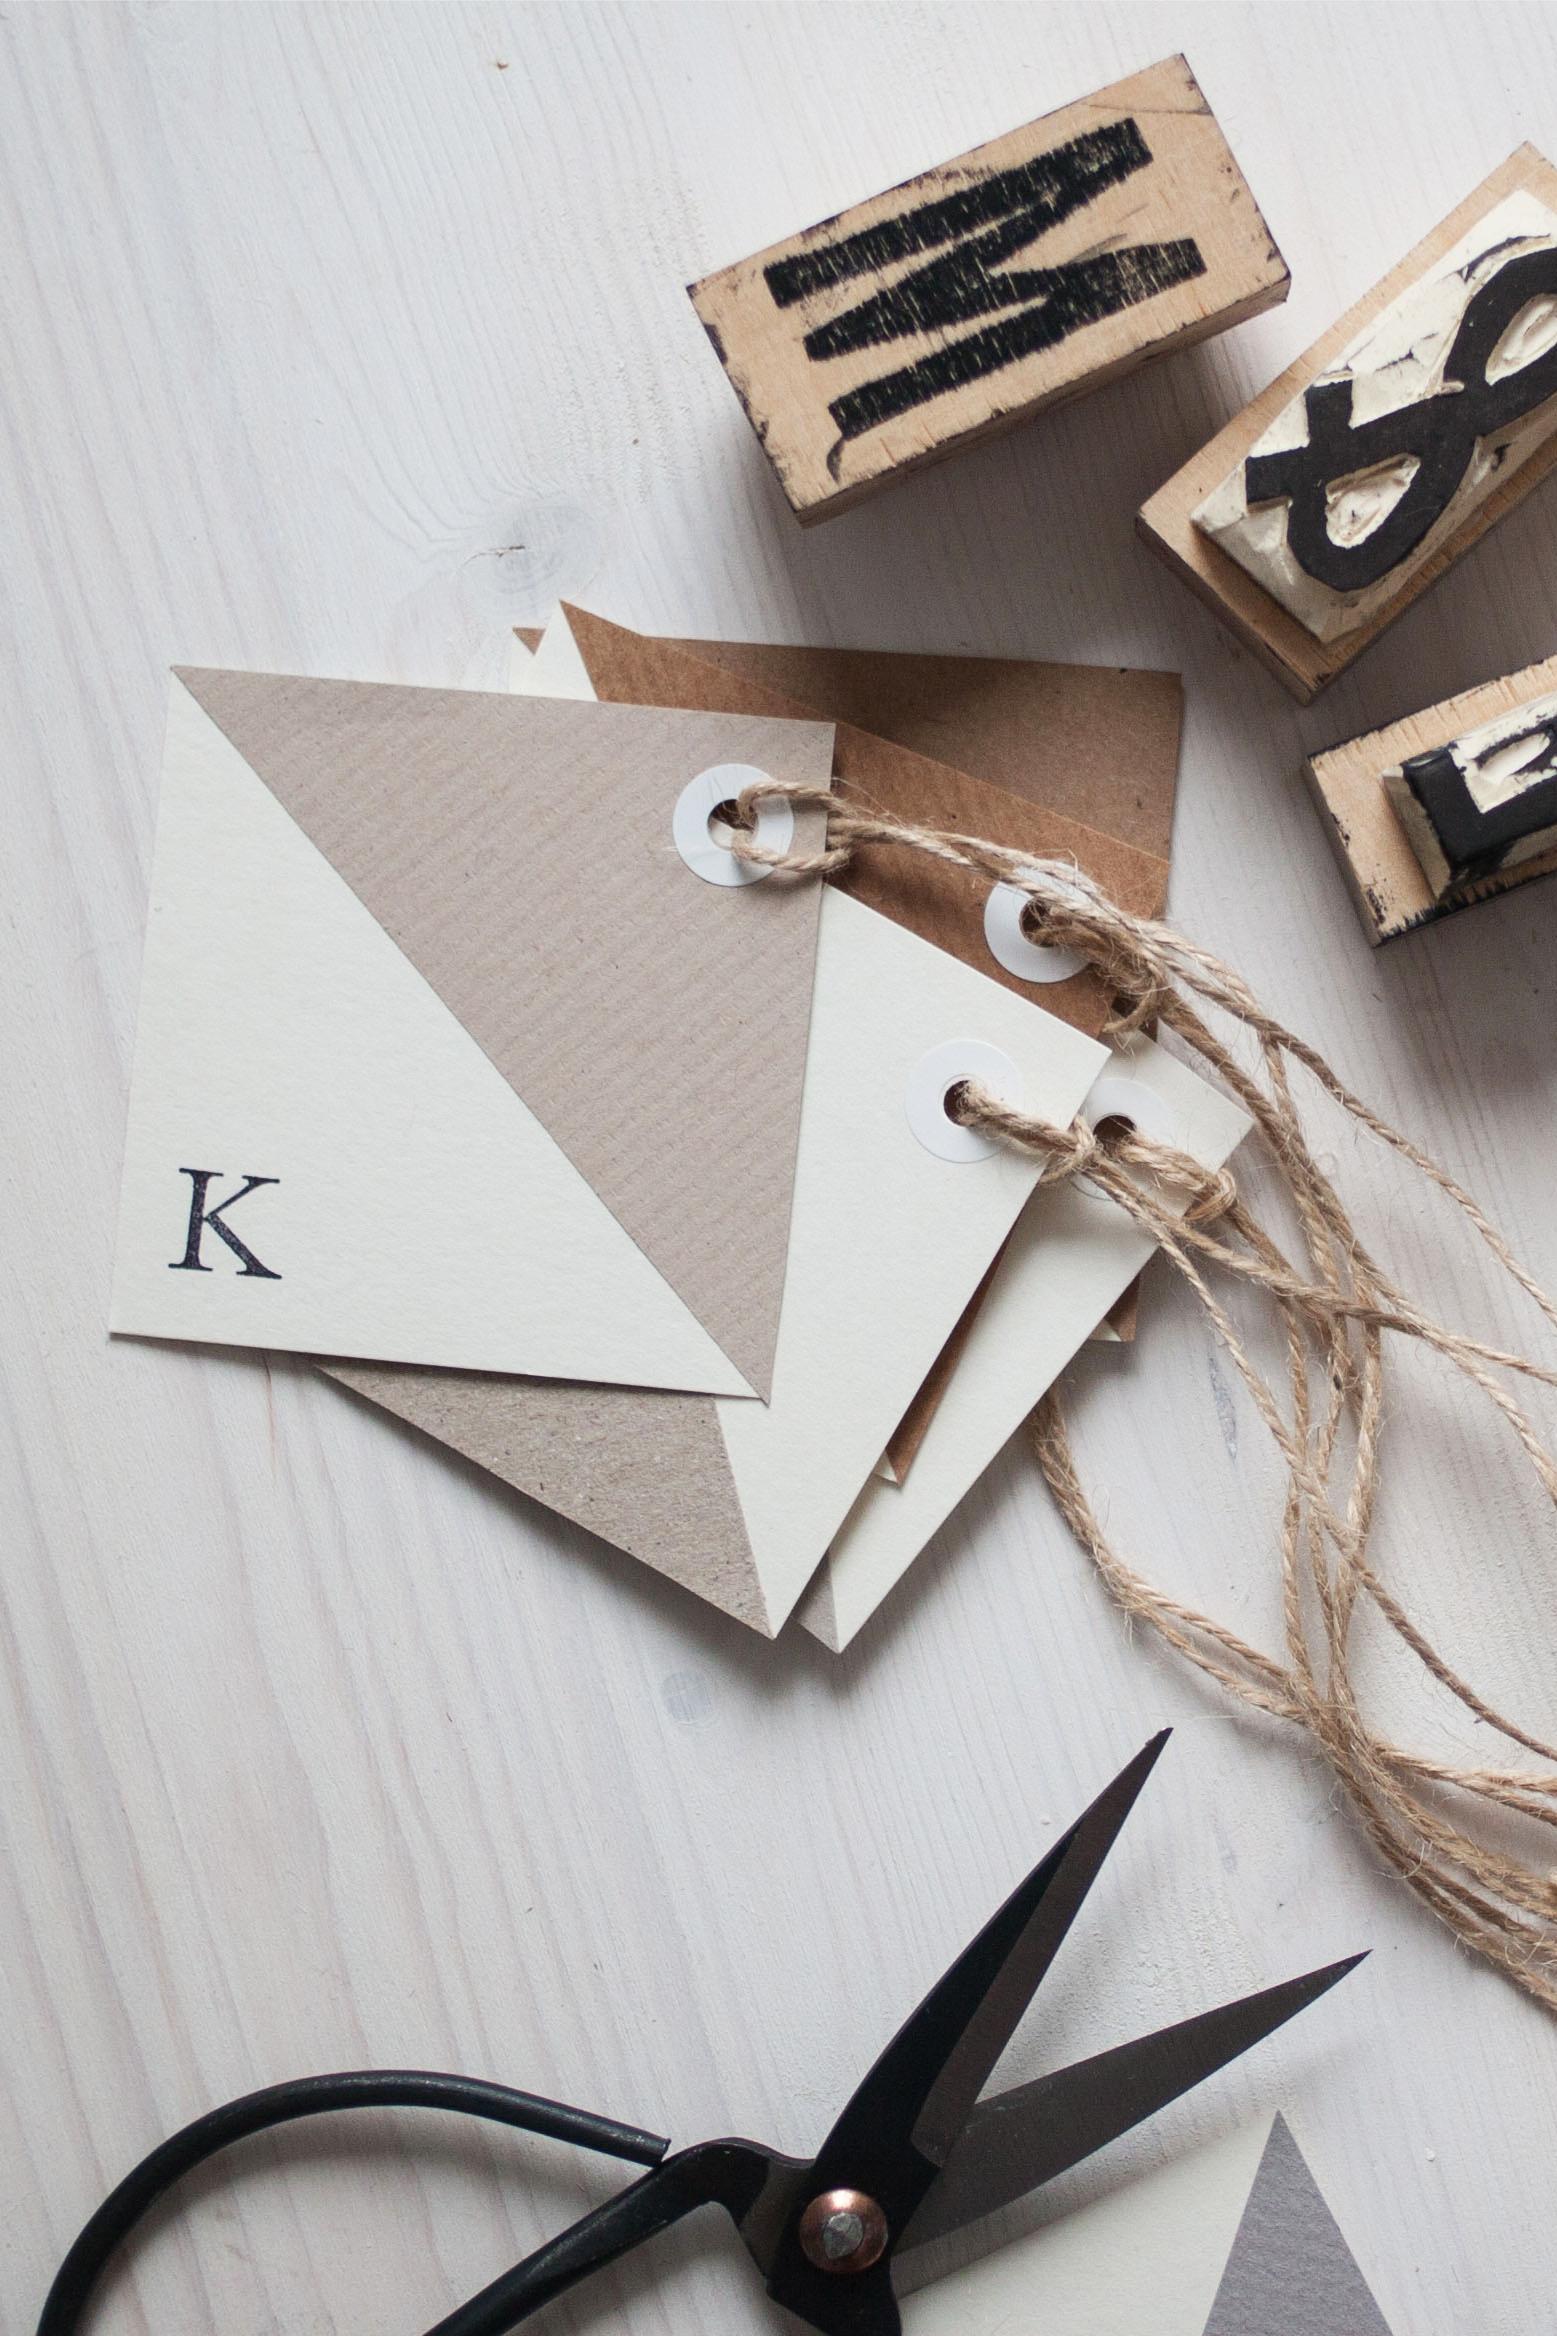 Quadratische Geschenkanhänger mit Stempeln beschriften